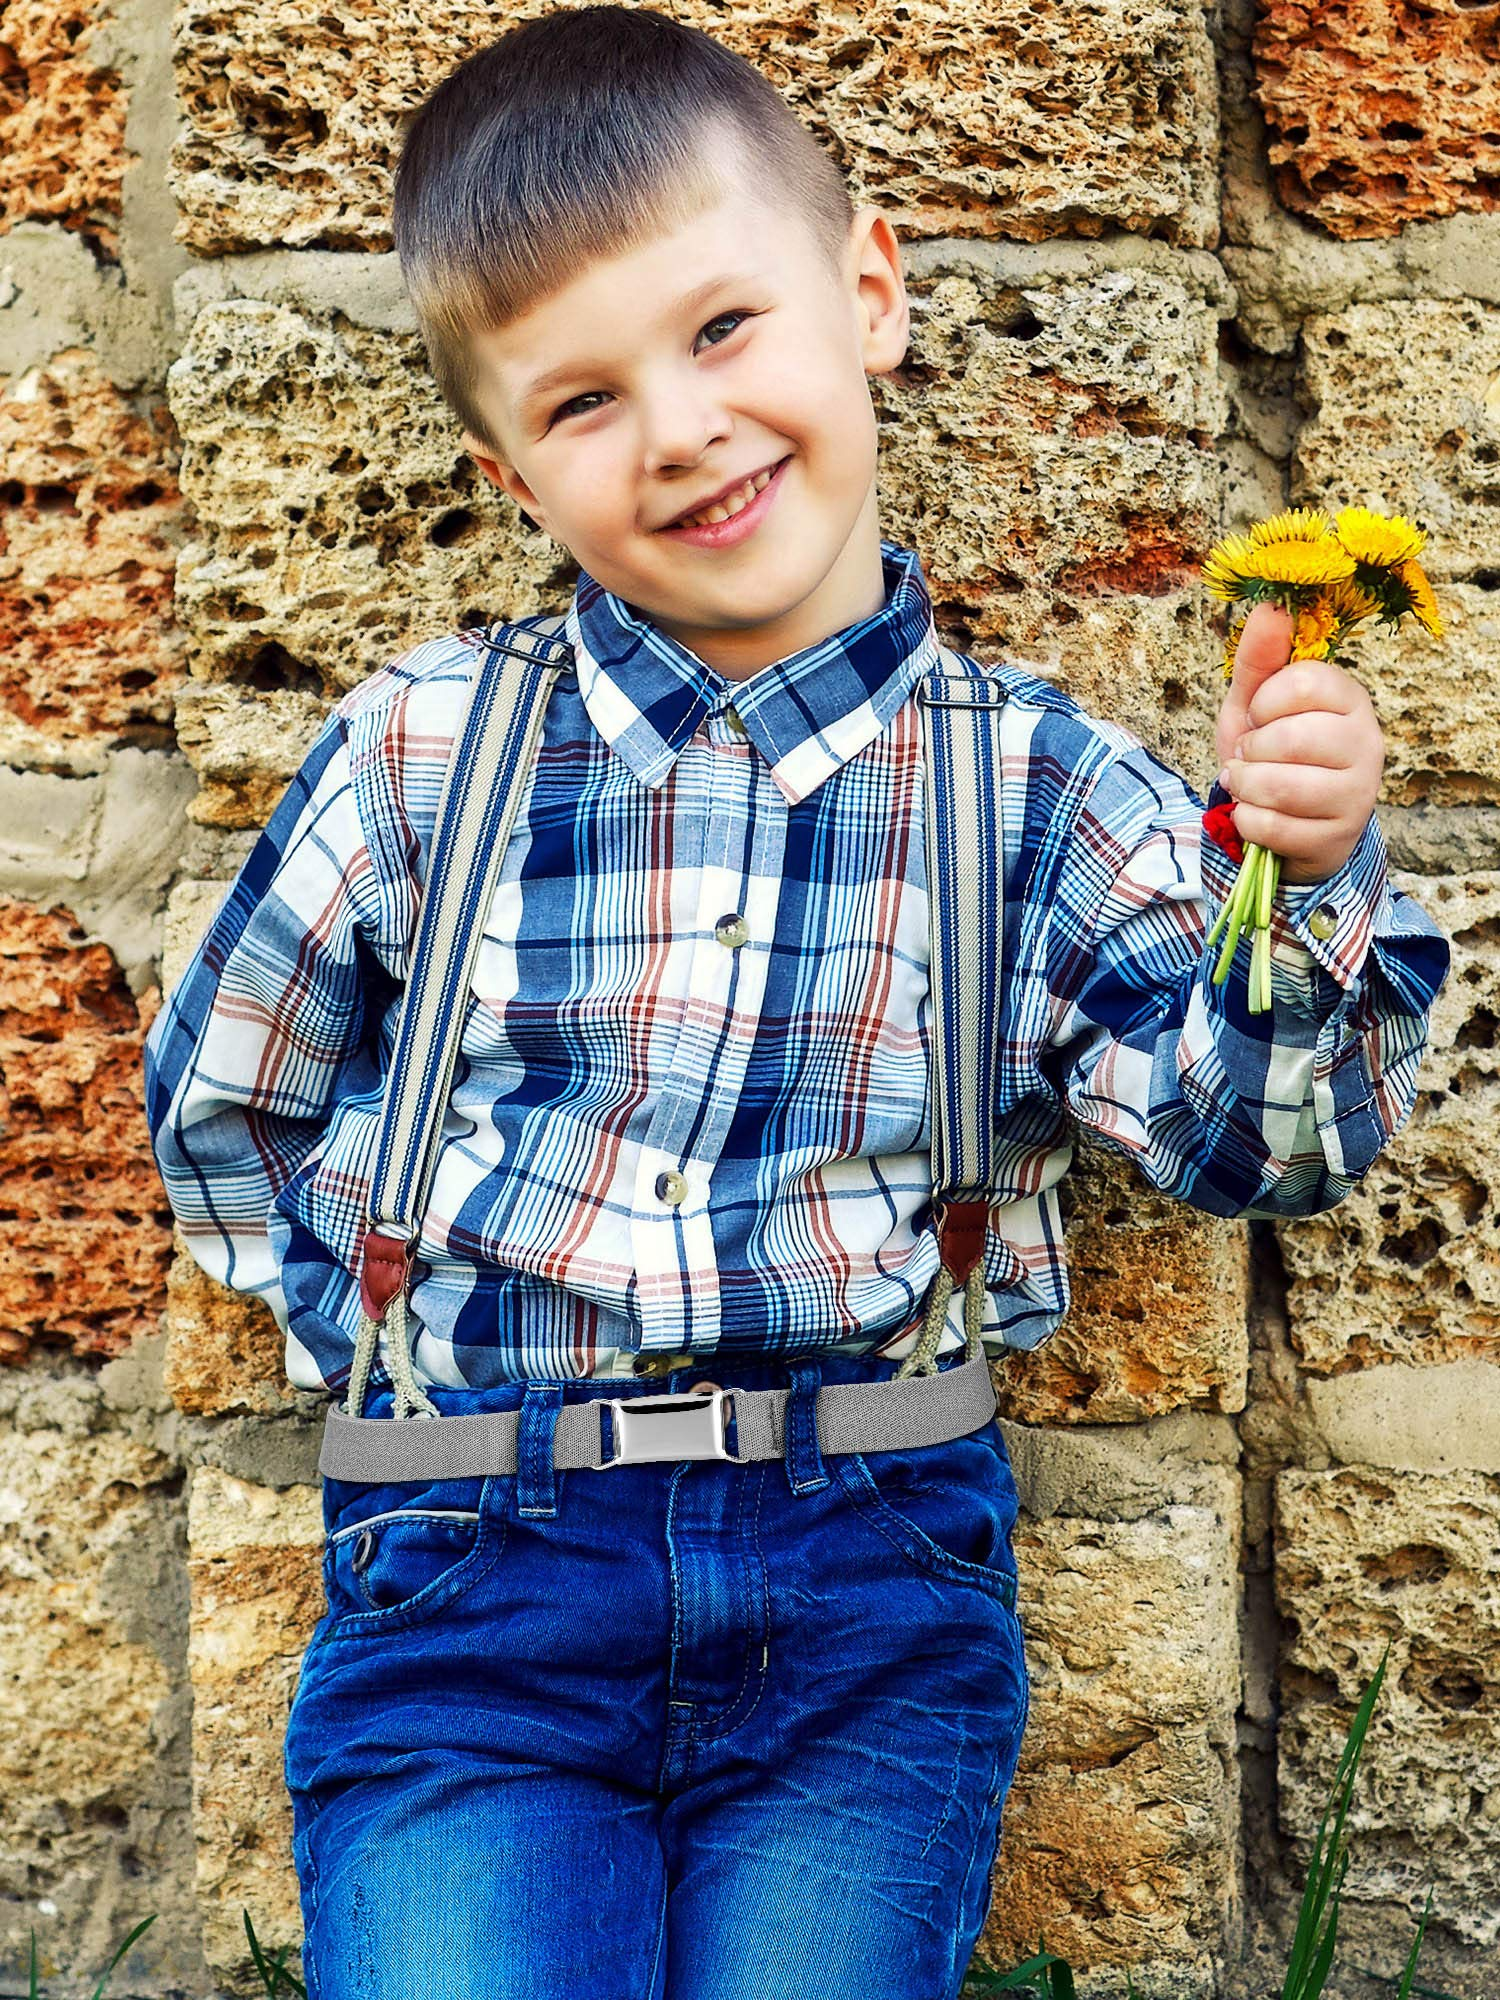 Tatuo 4 Pieces Kids Buckle Belt Kid Adjustable Elastic Belt Boy Stretch Belt for Children Favor (black, gray, brown, navy blue) by Tatuo (Image #7)